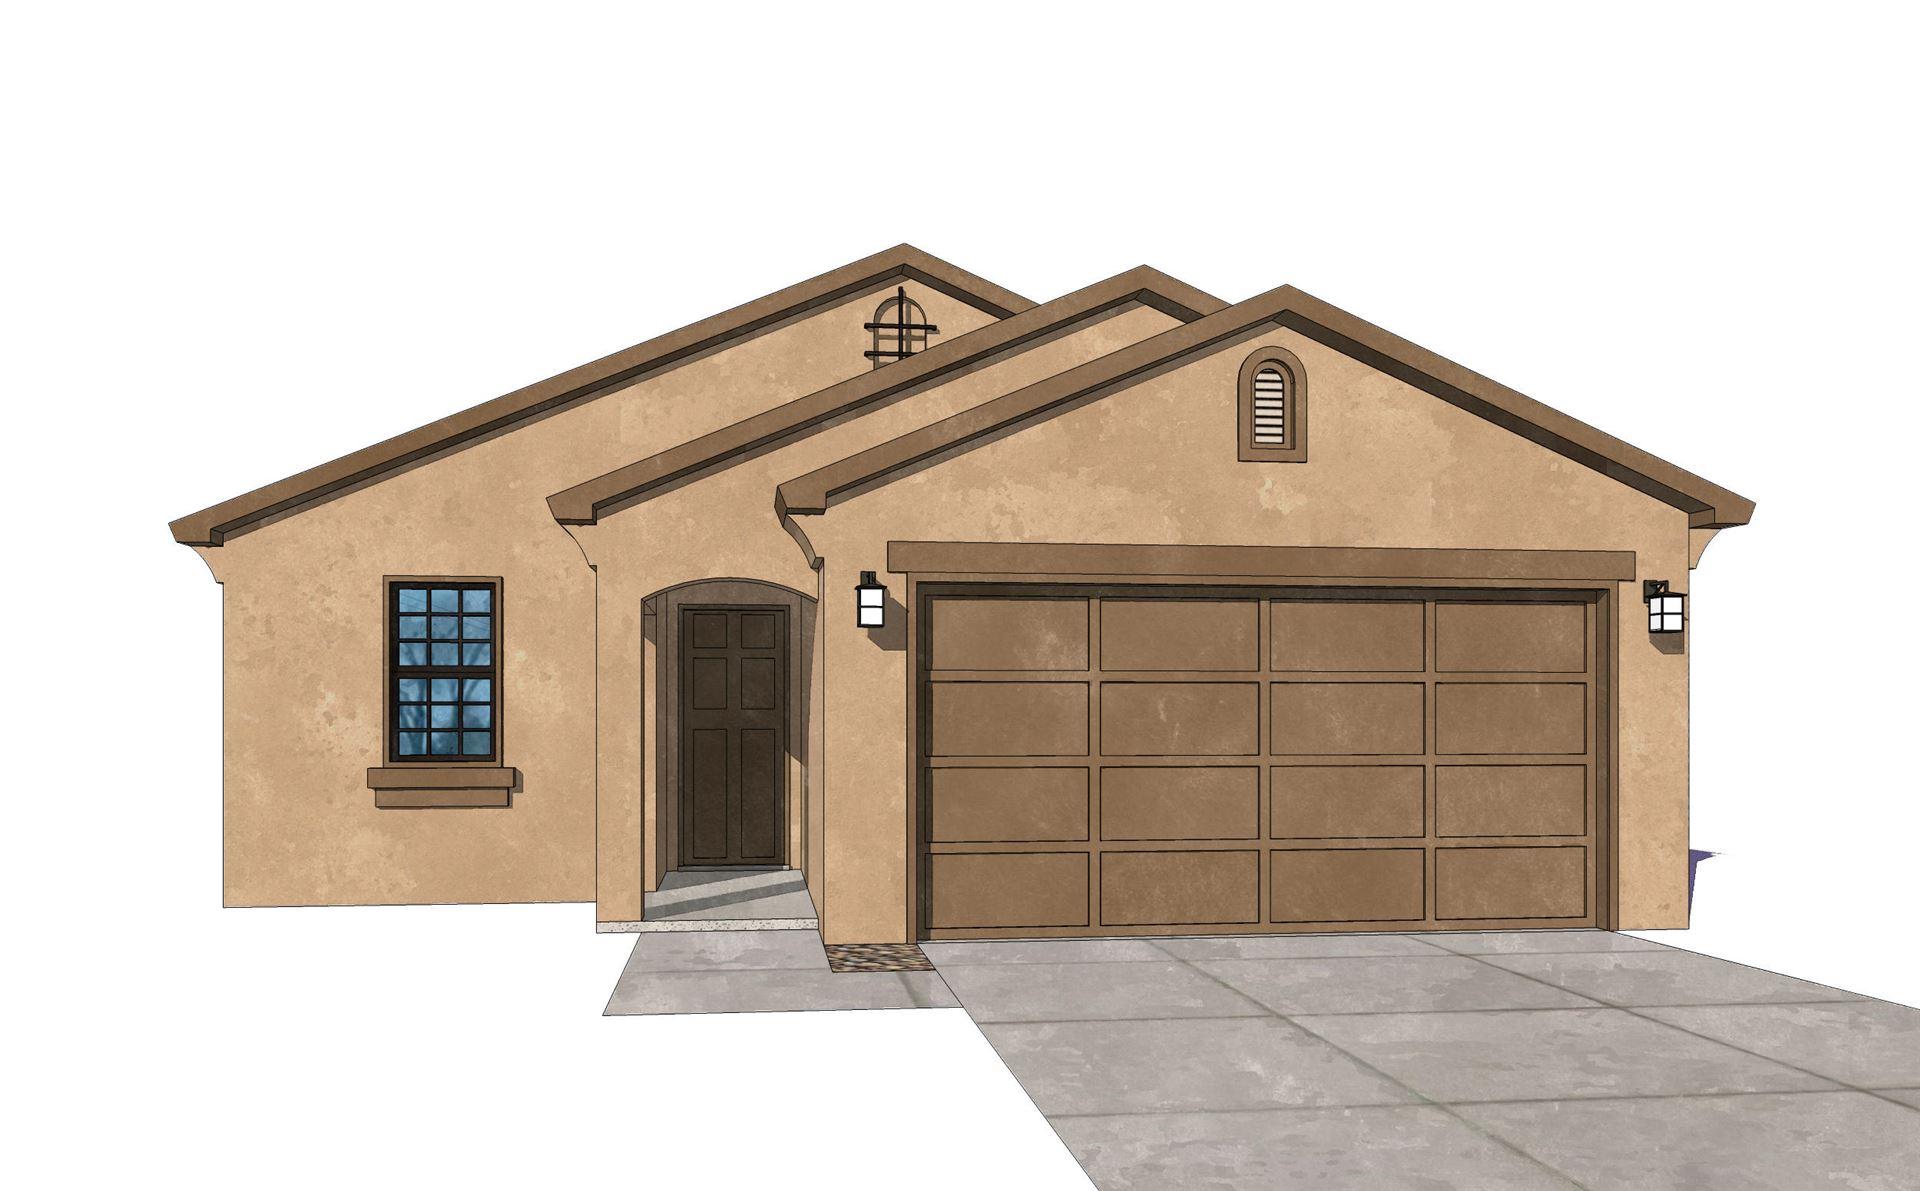 2716 Camino Plata Loop NE, Rio Rancho, NM 87144 - MLS#: 983585